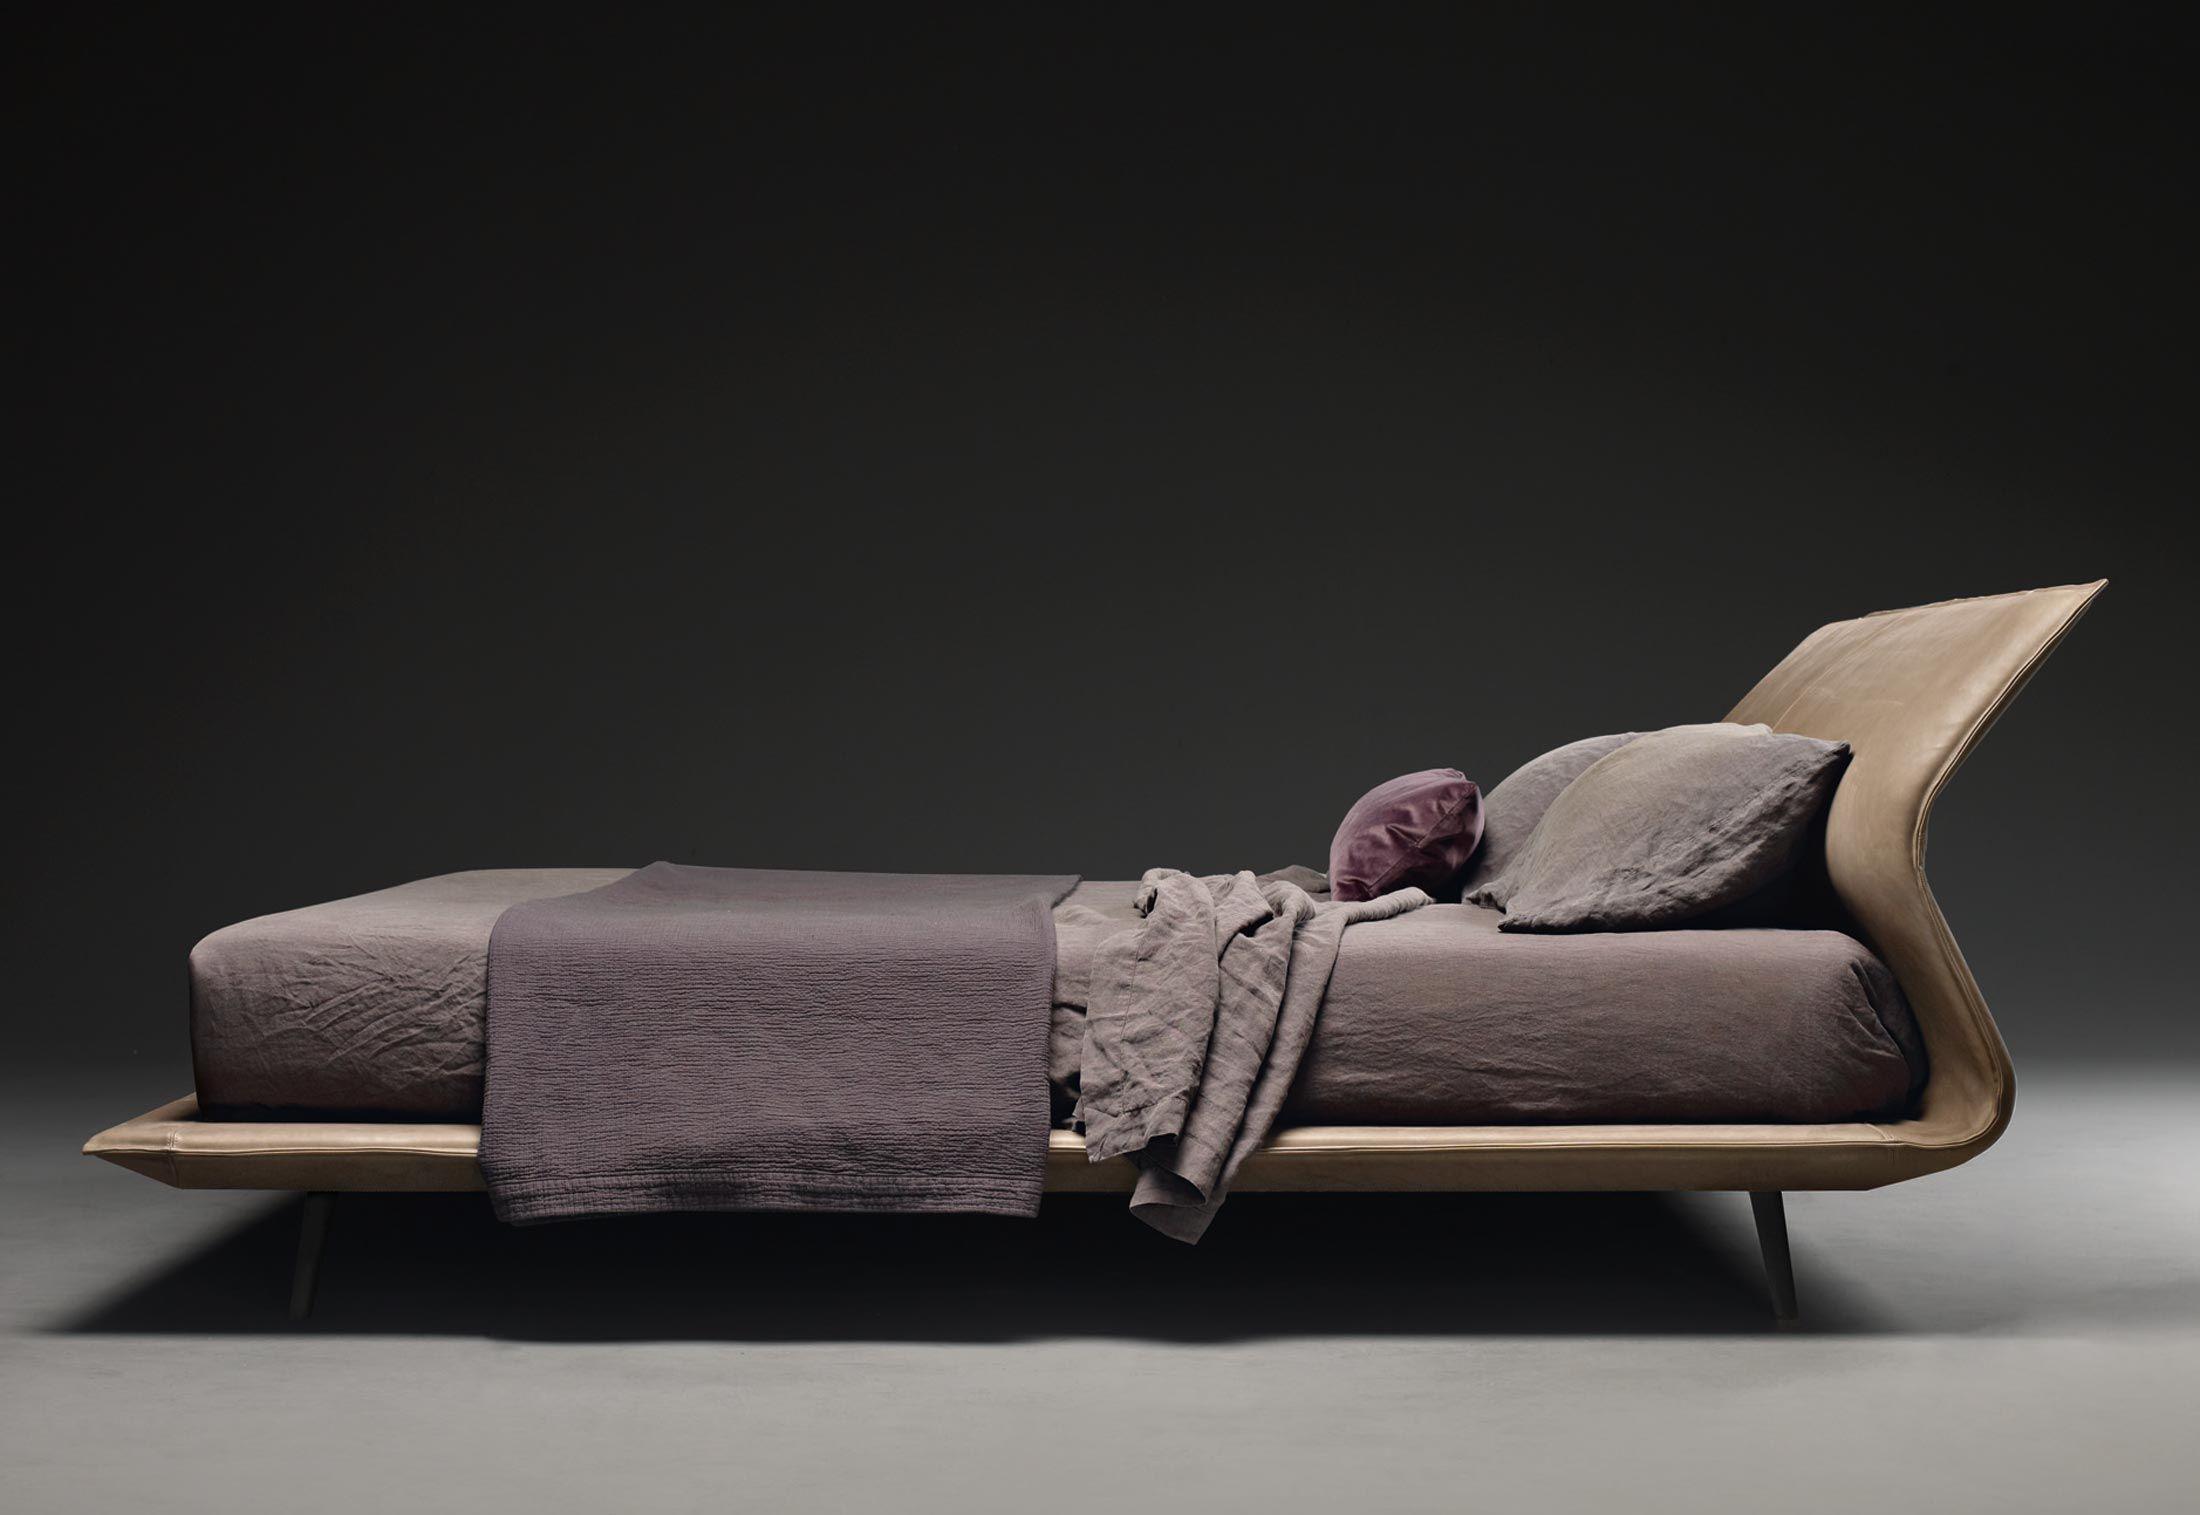 Night Day Bed Patricia Urquiola For Molteni C Love